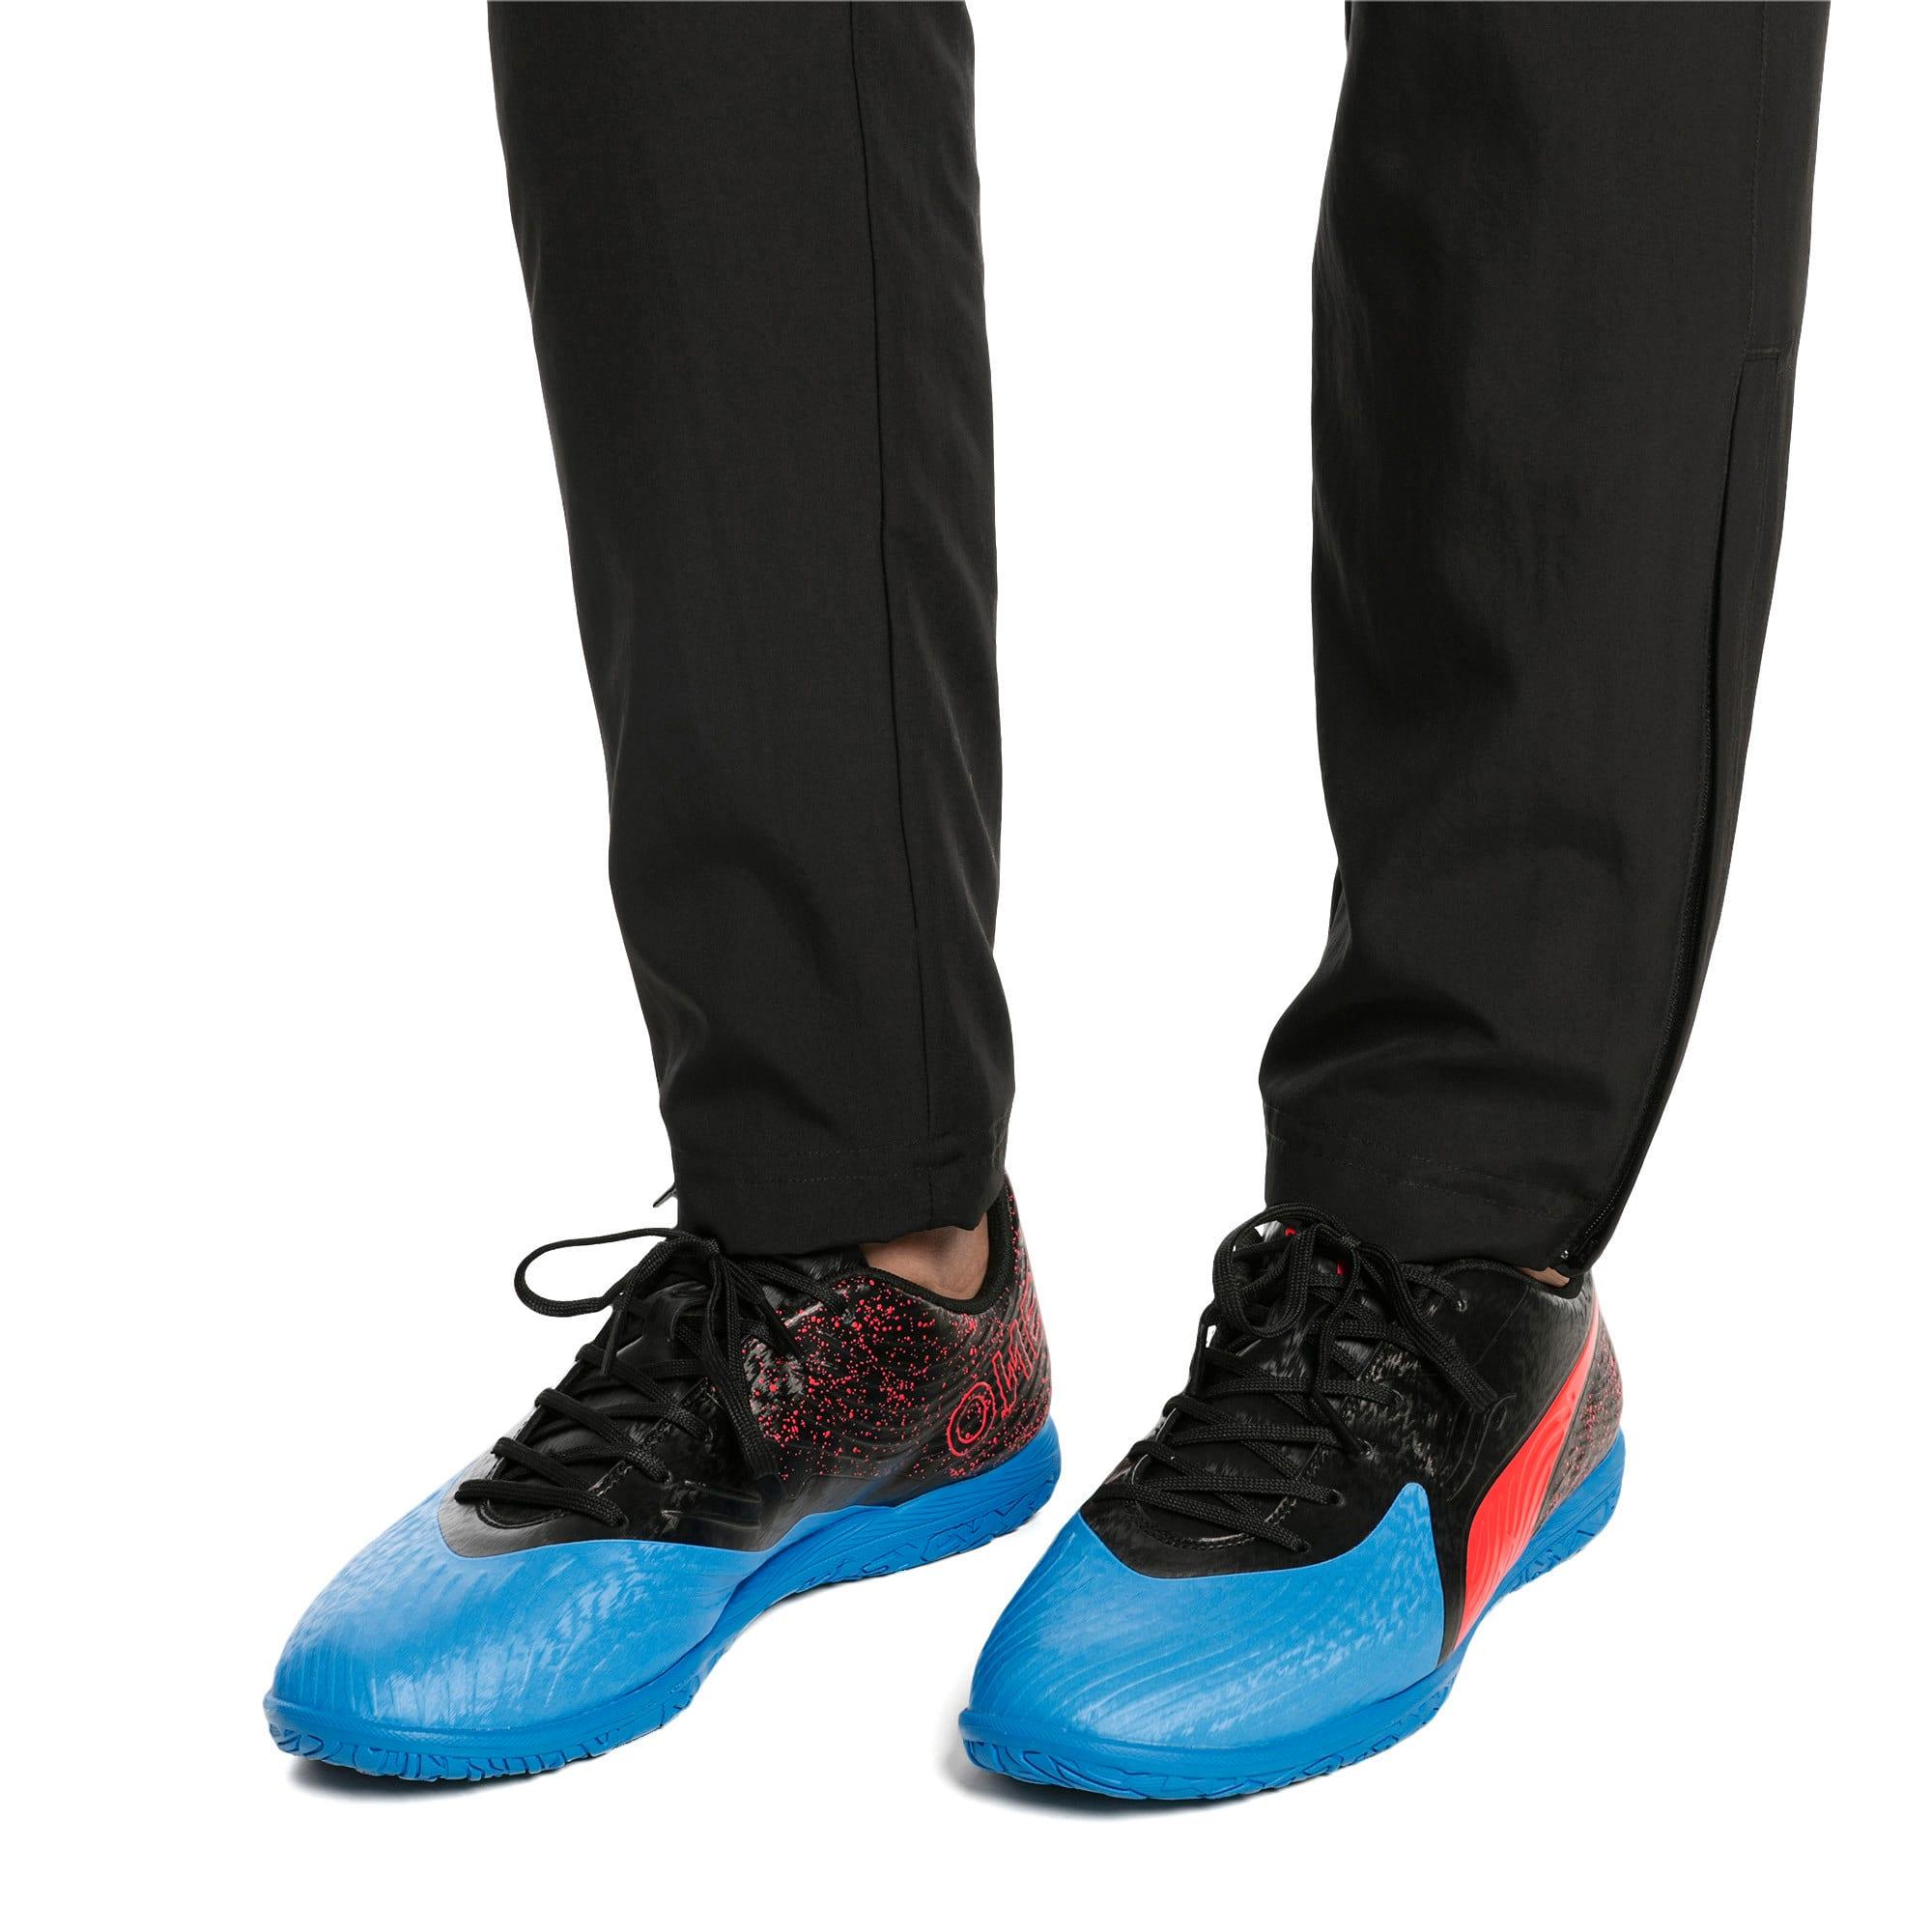 Thumbnail 2 of PUMA ONE 19.4 IT Men's Football Boots, Bleu Azur-Red Blast-Black, medium-IND